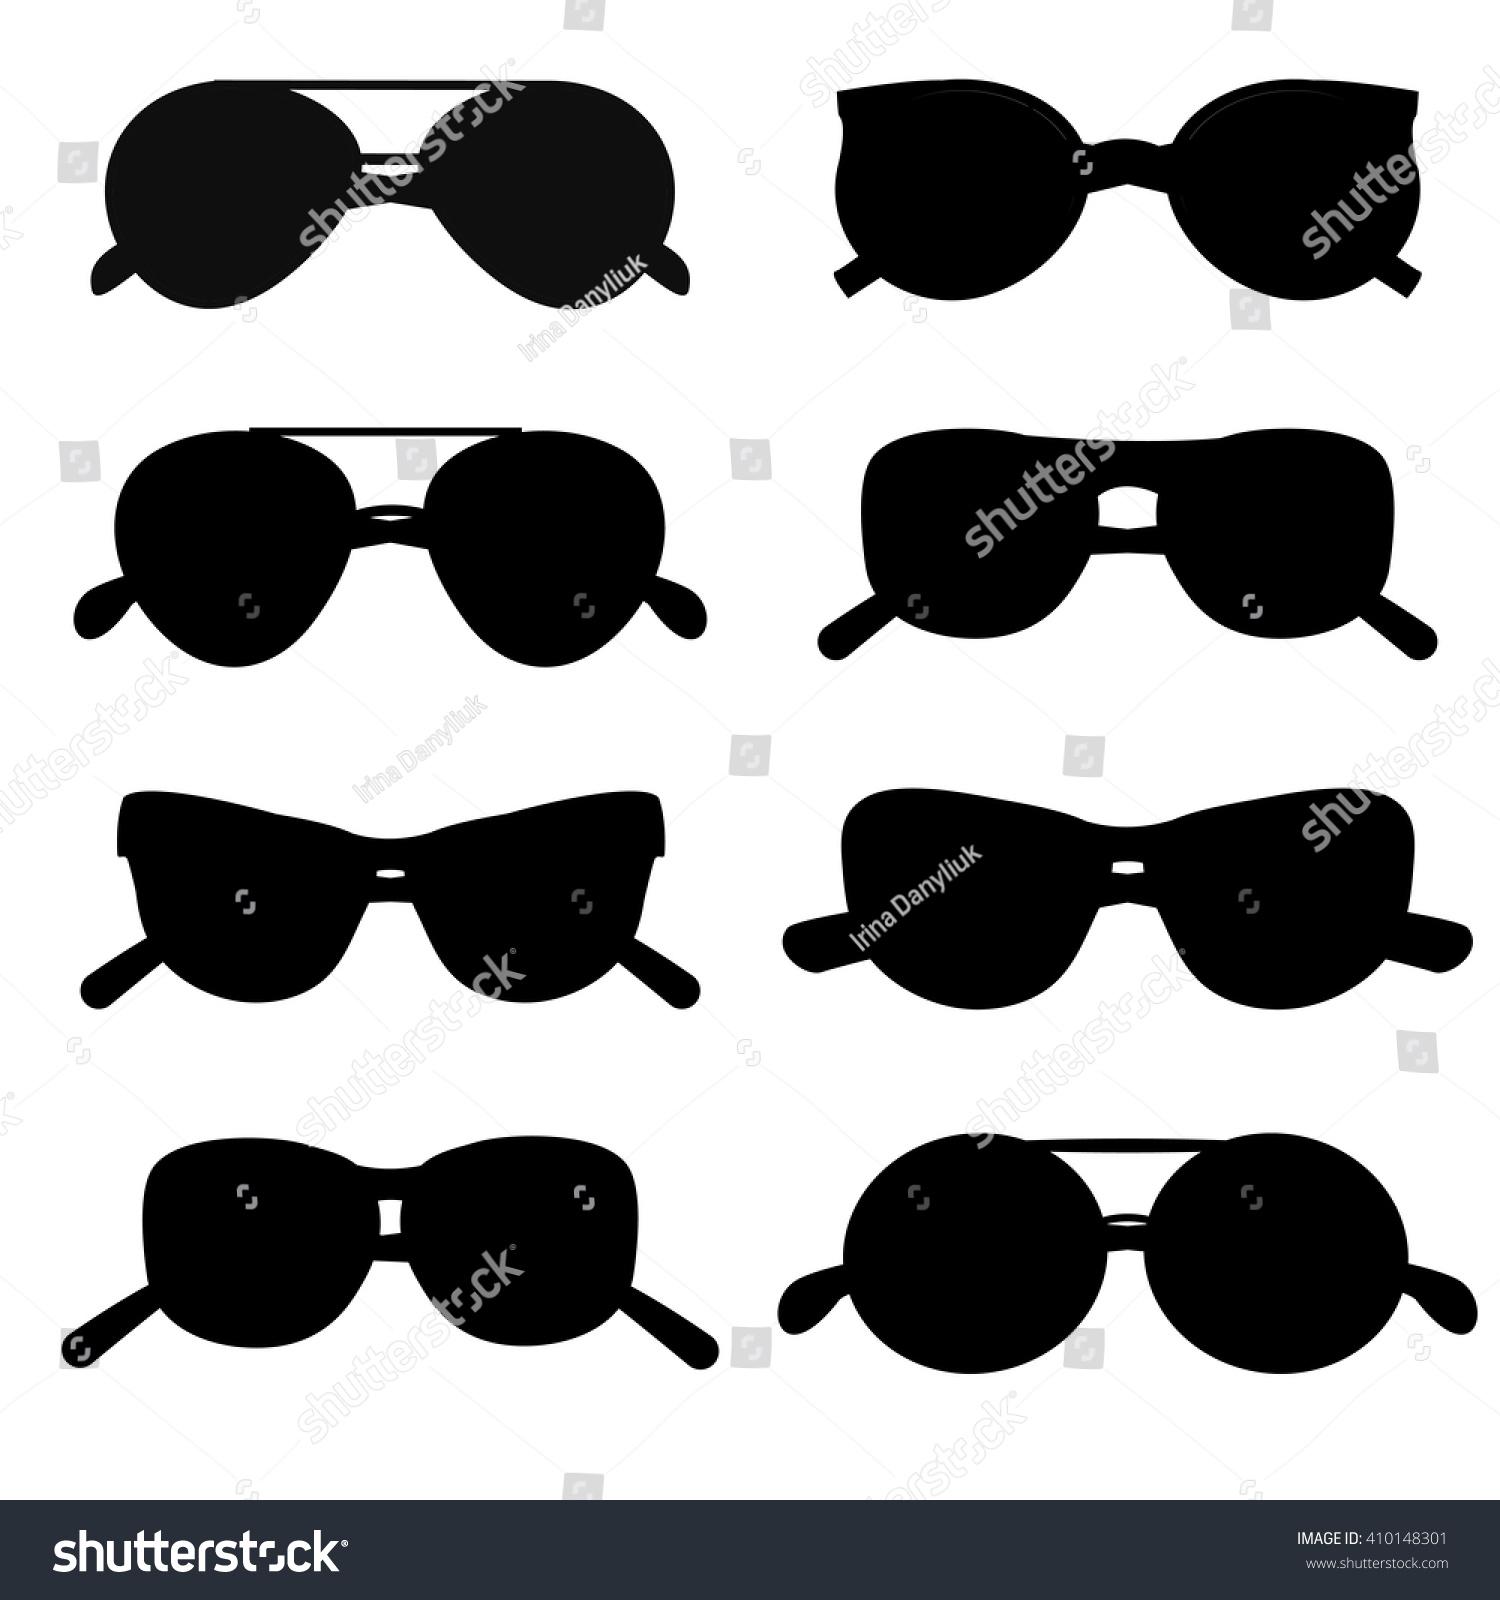 0ed9414fc237 Silhouette Sunglasses Aviator - Bitterroot Public Library